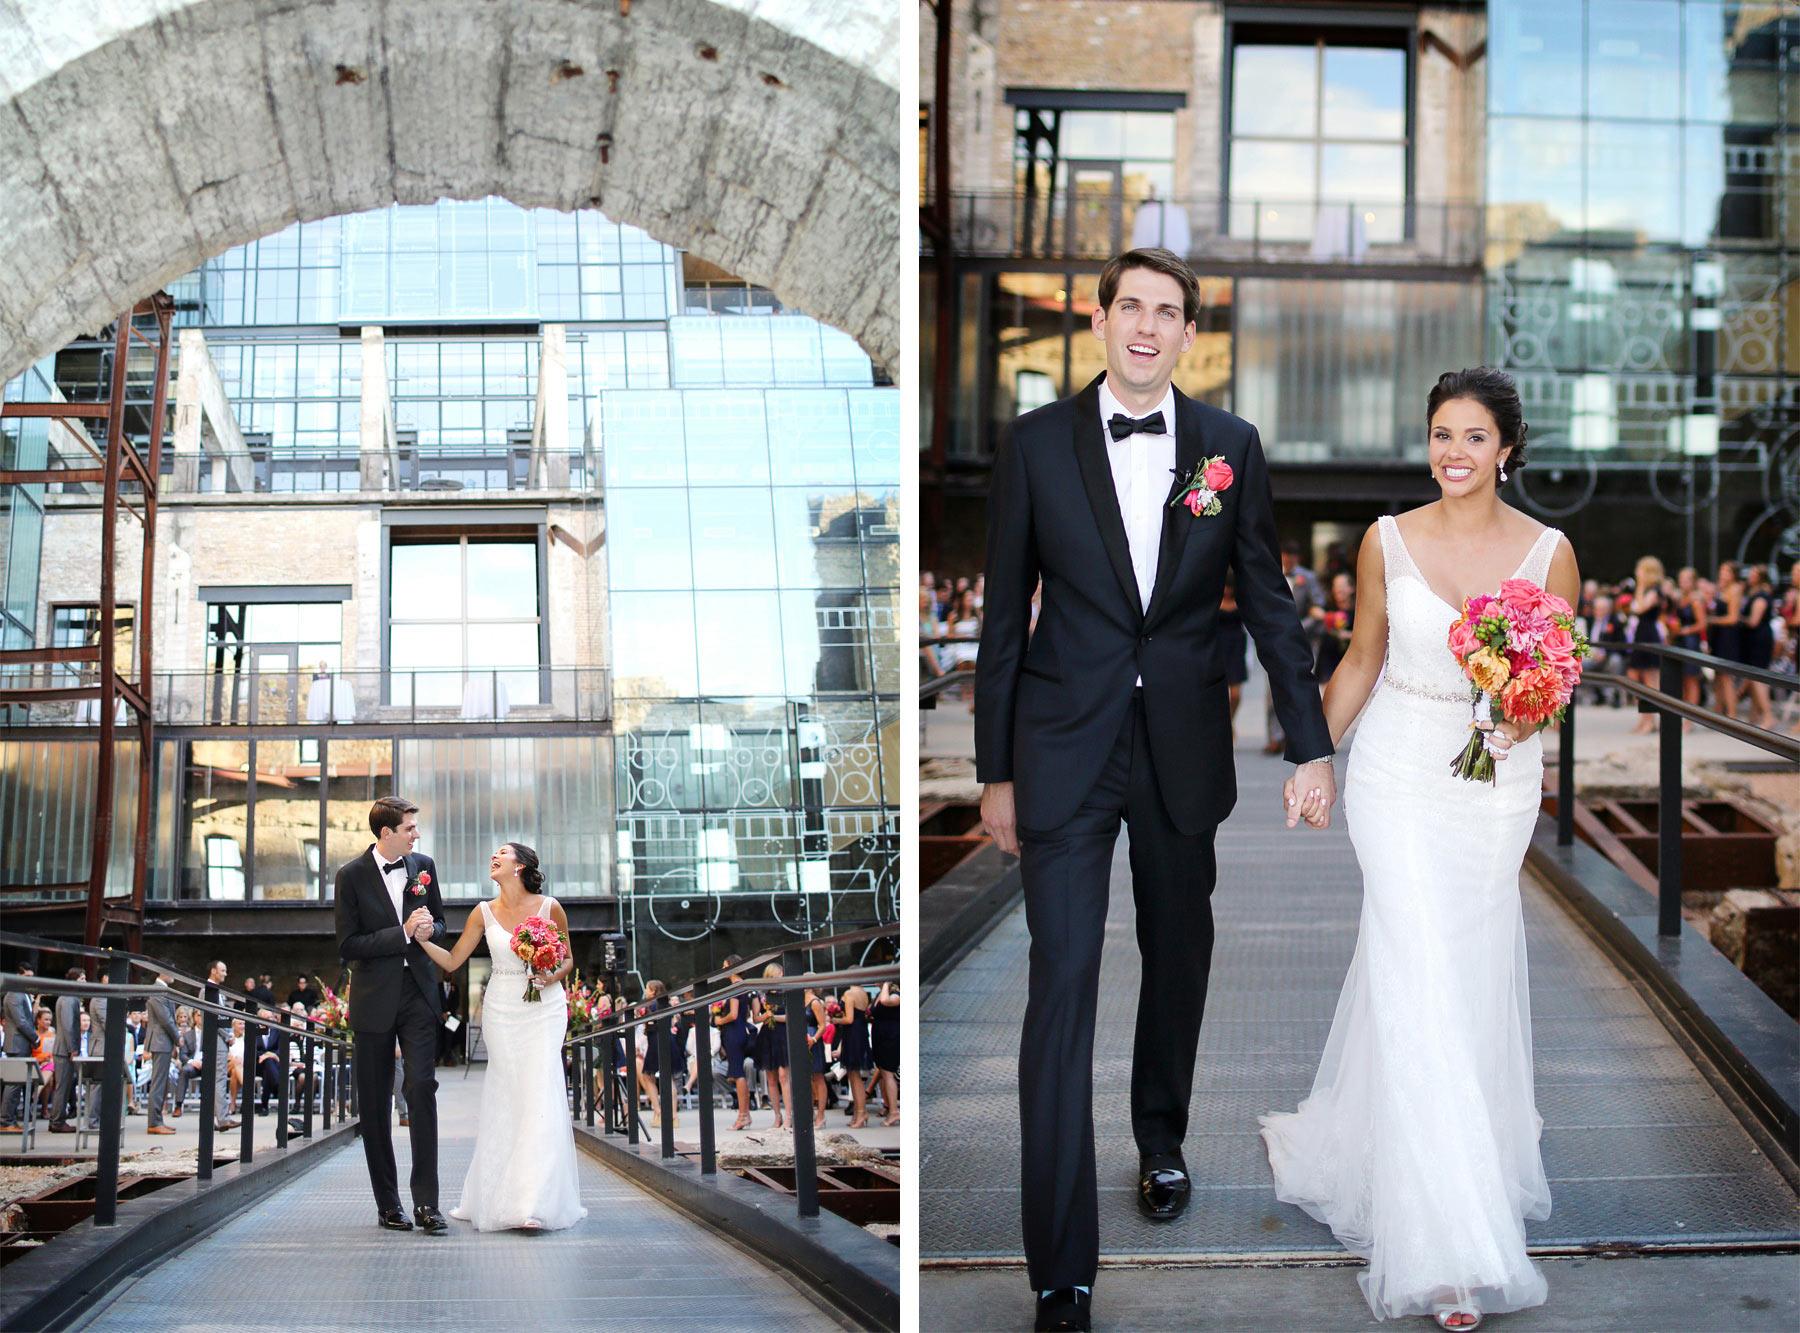 18-Minneapolis-Minnesota-Wedding-Photography-by-Vick-Photography-Downtown-Mill-City-Museum-Ceremony-Outdoor-Wedding-Lalu-&-John.jpg